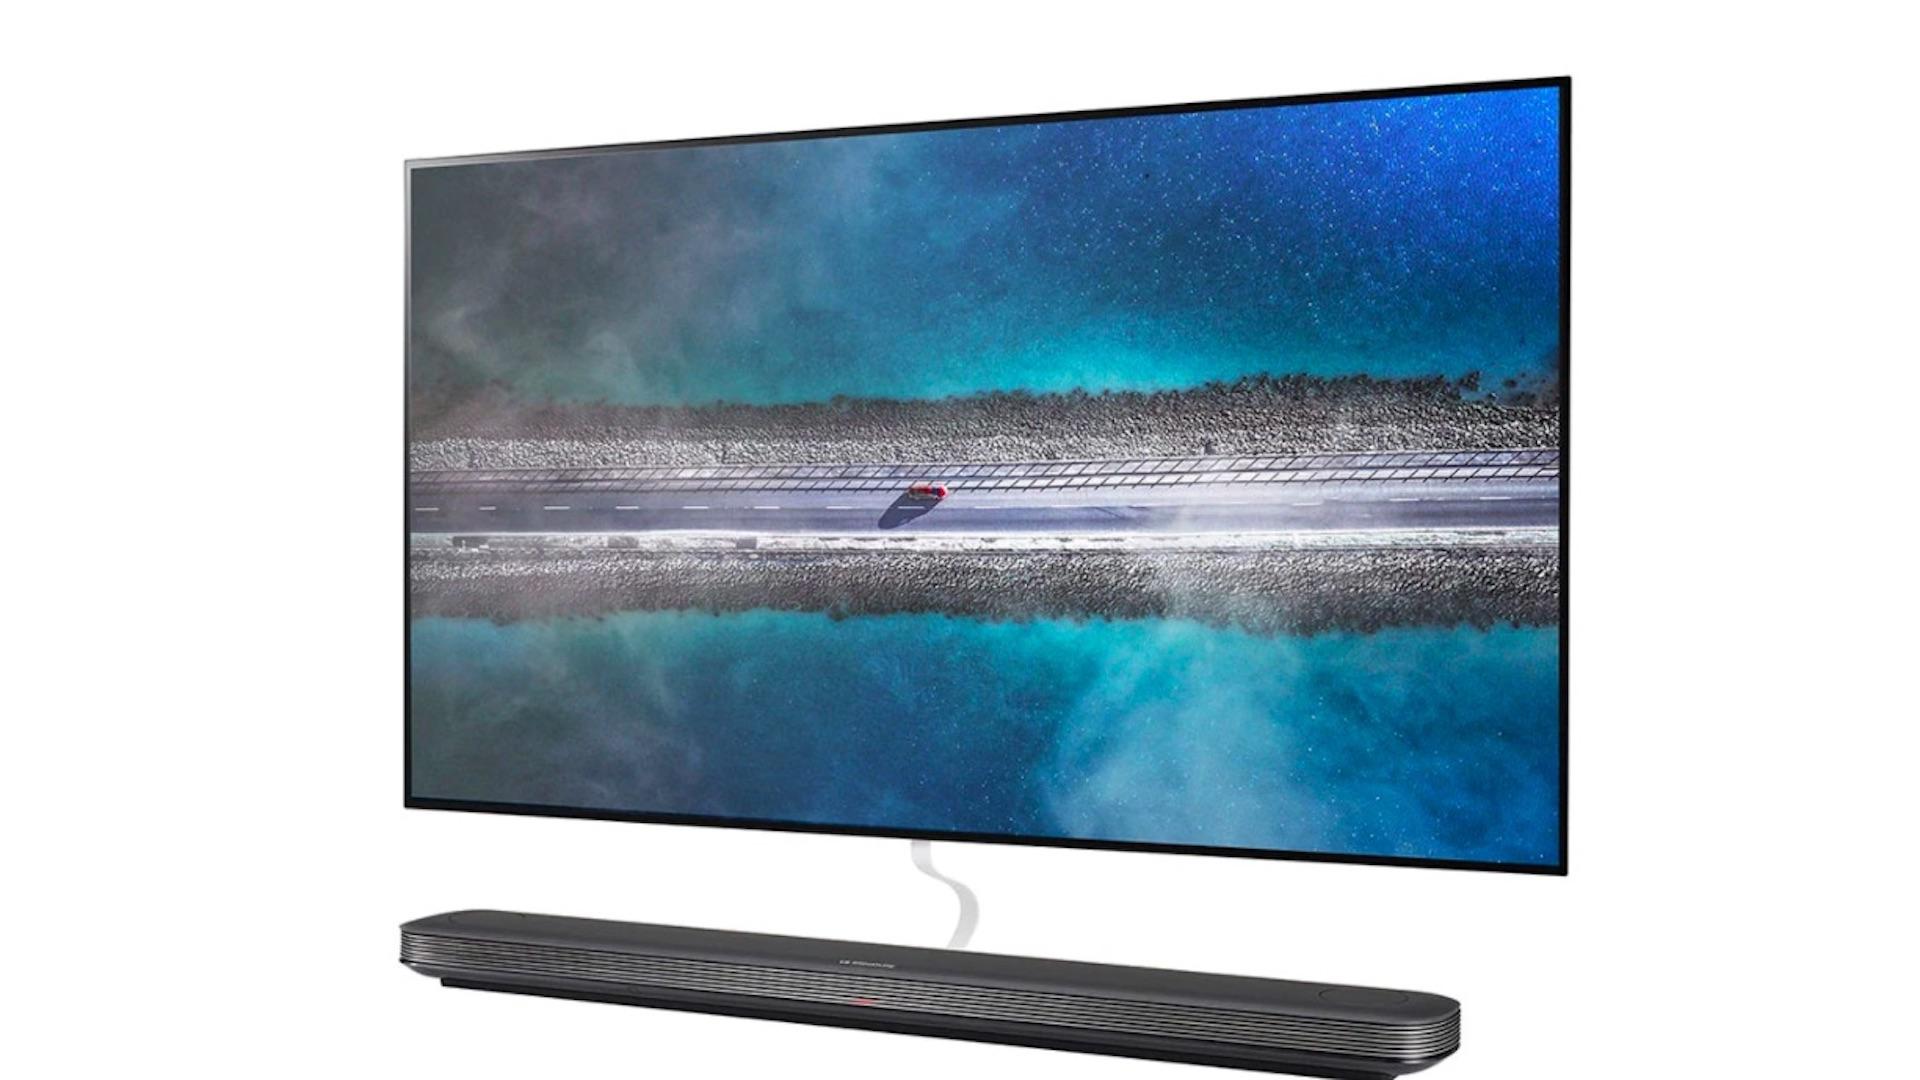 Pantalla LG OLED TV AI ThinQ 4K 77''. Foto de LG